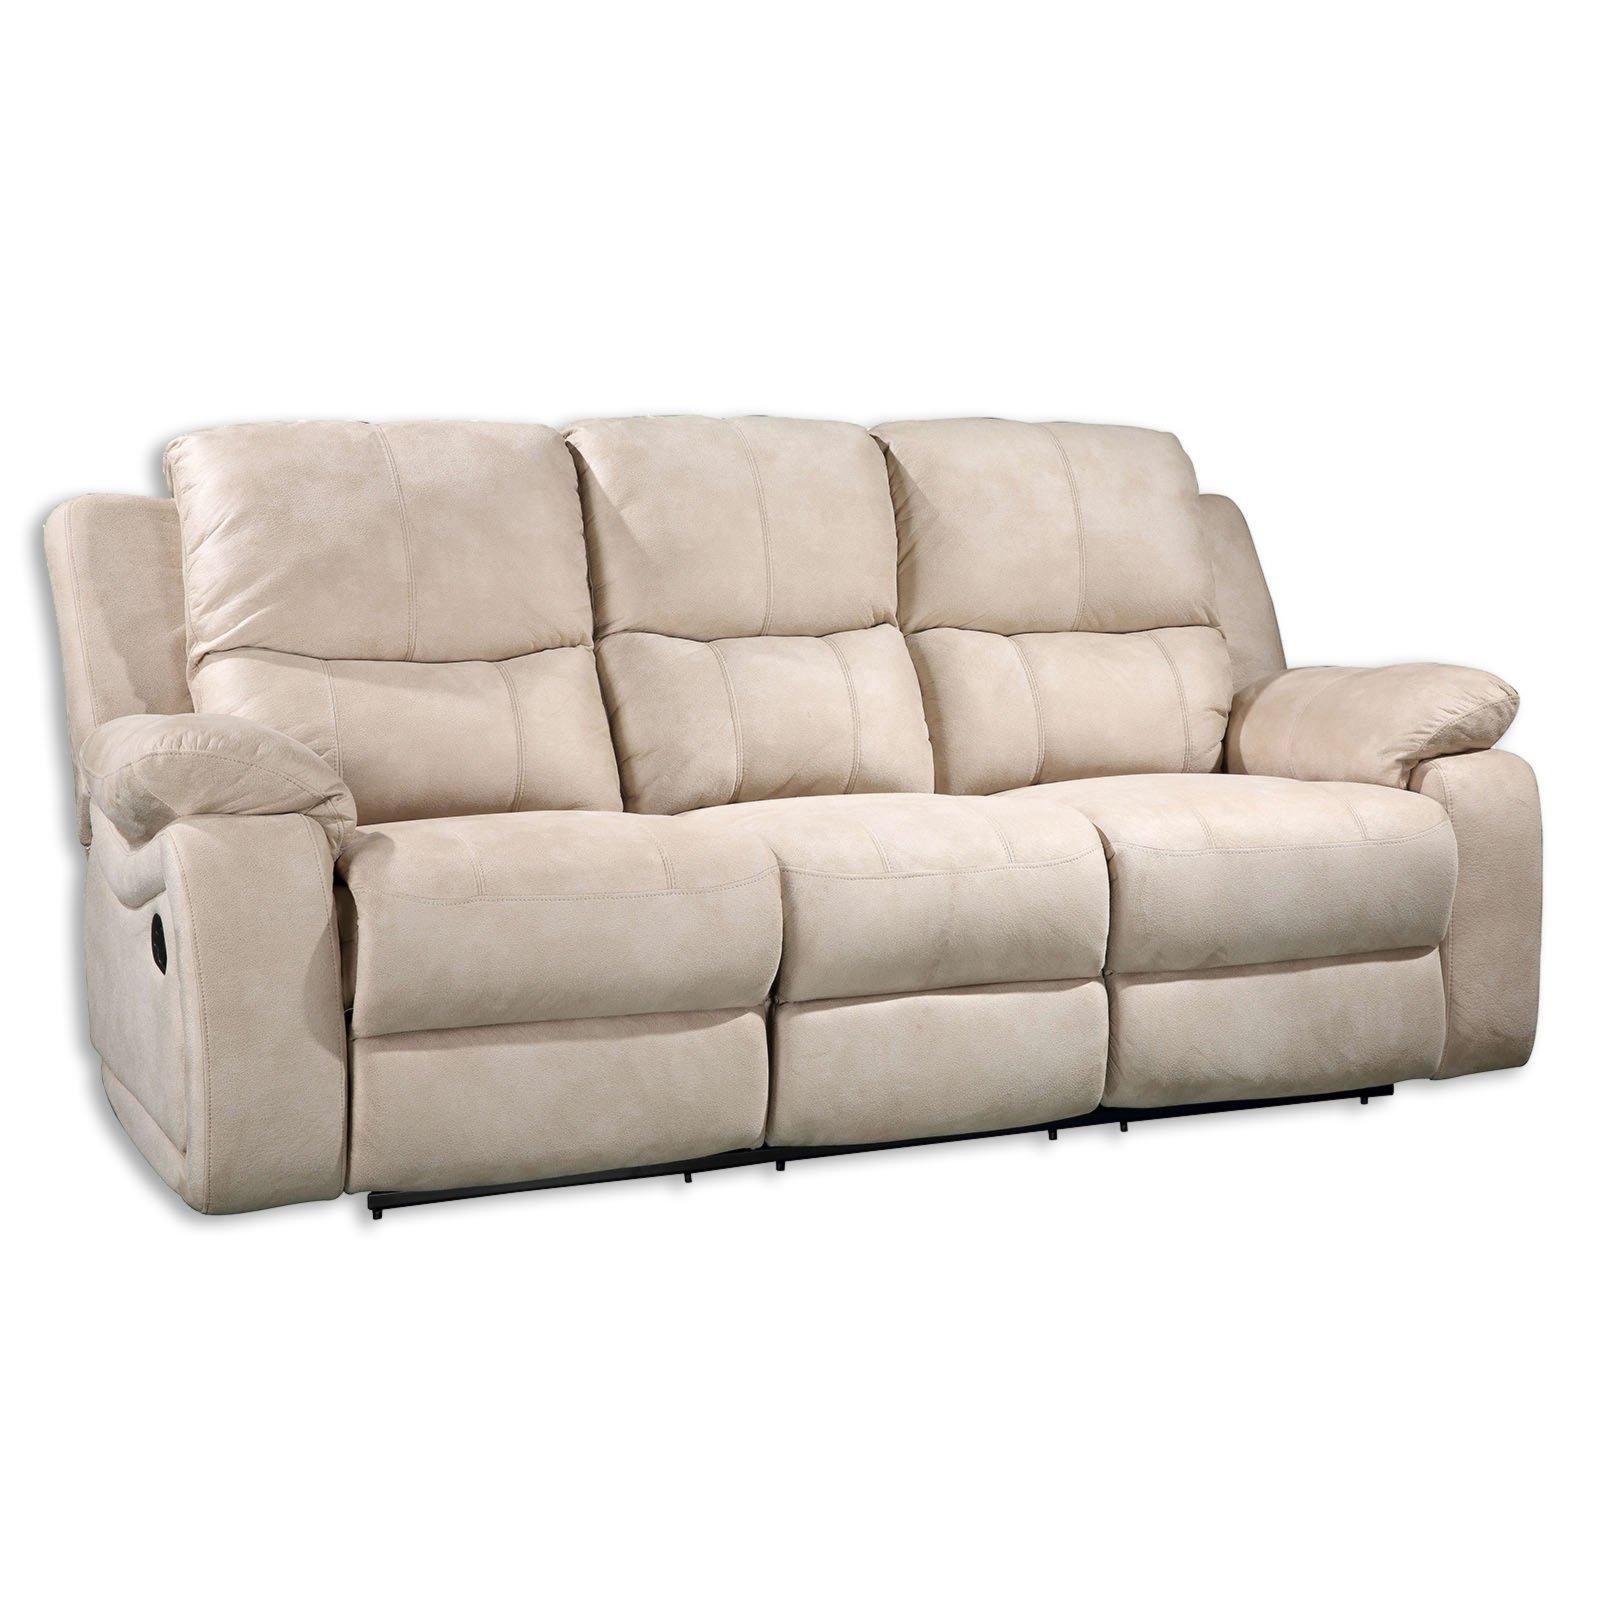 sofa 3 sitzer beige mit relaxfunktion 207 cm breit. Black Bedroom Furniture Sets. Home Design Ideas